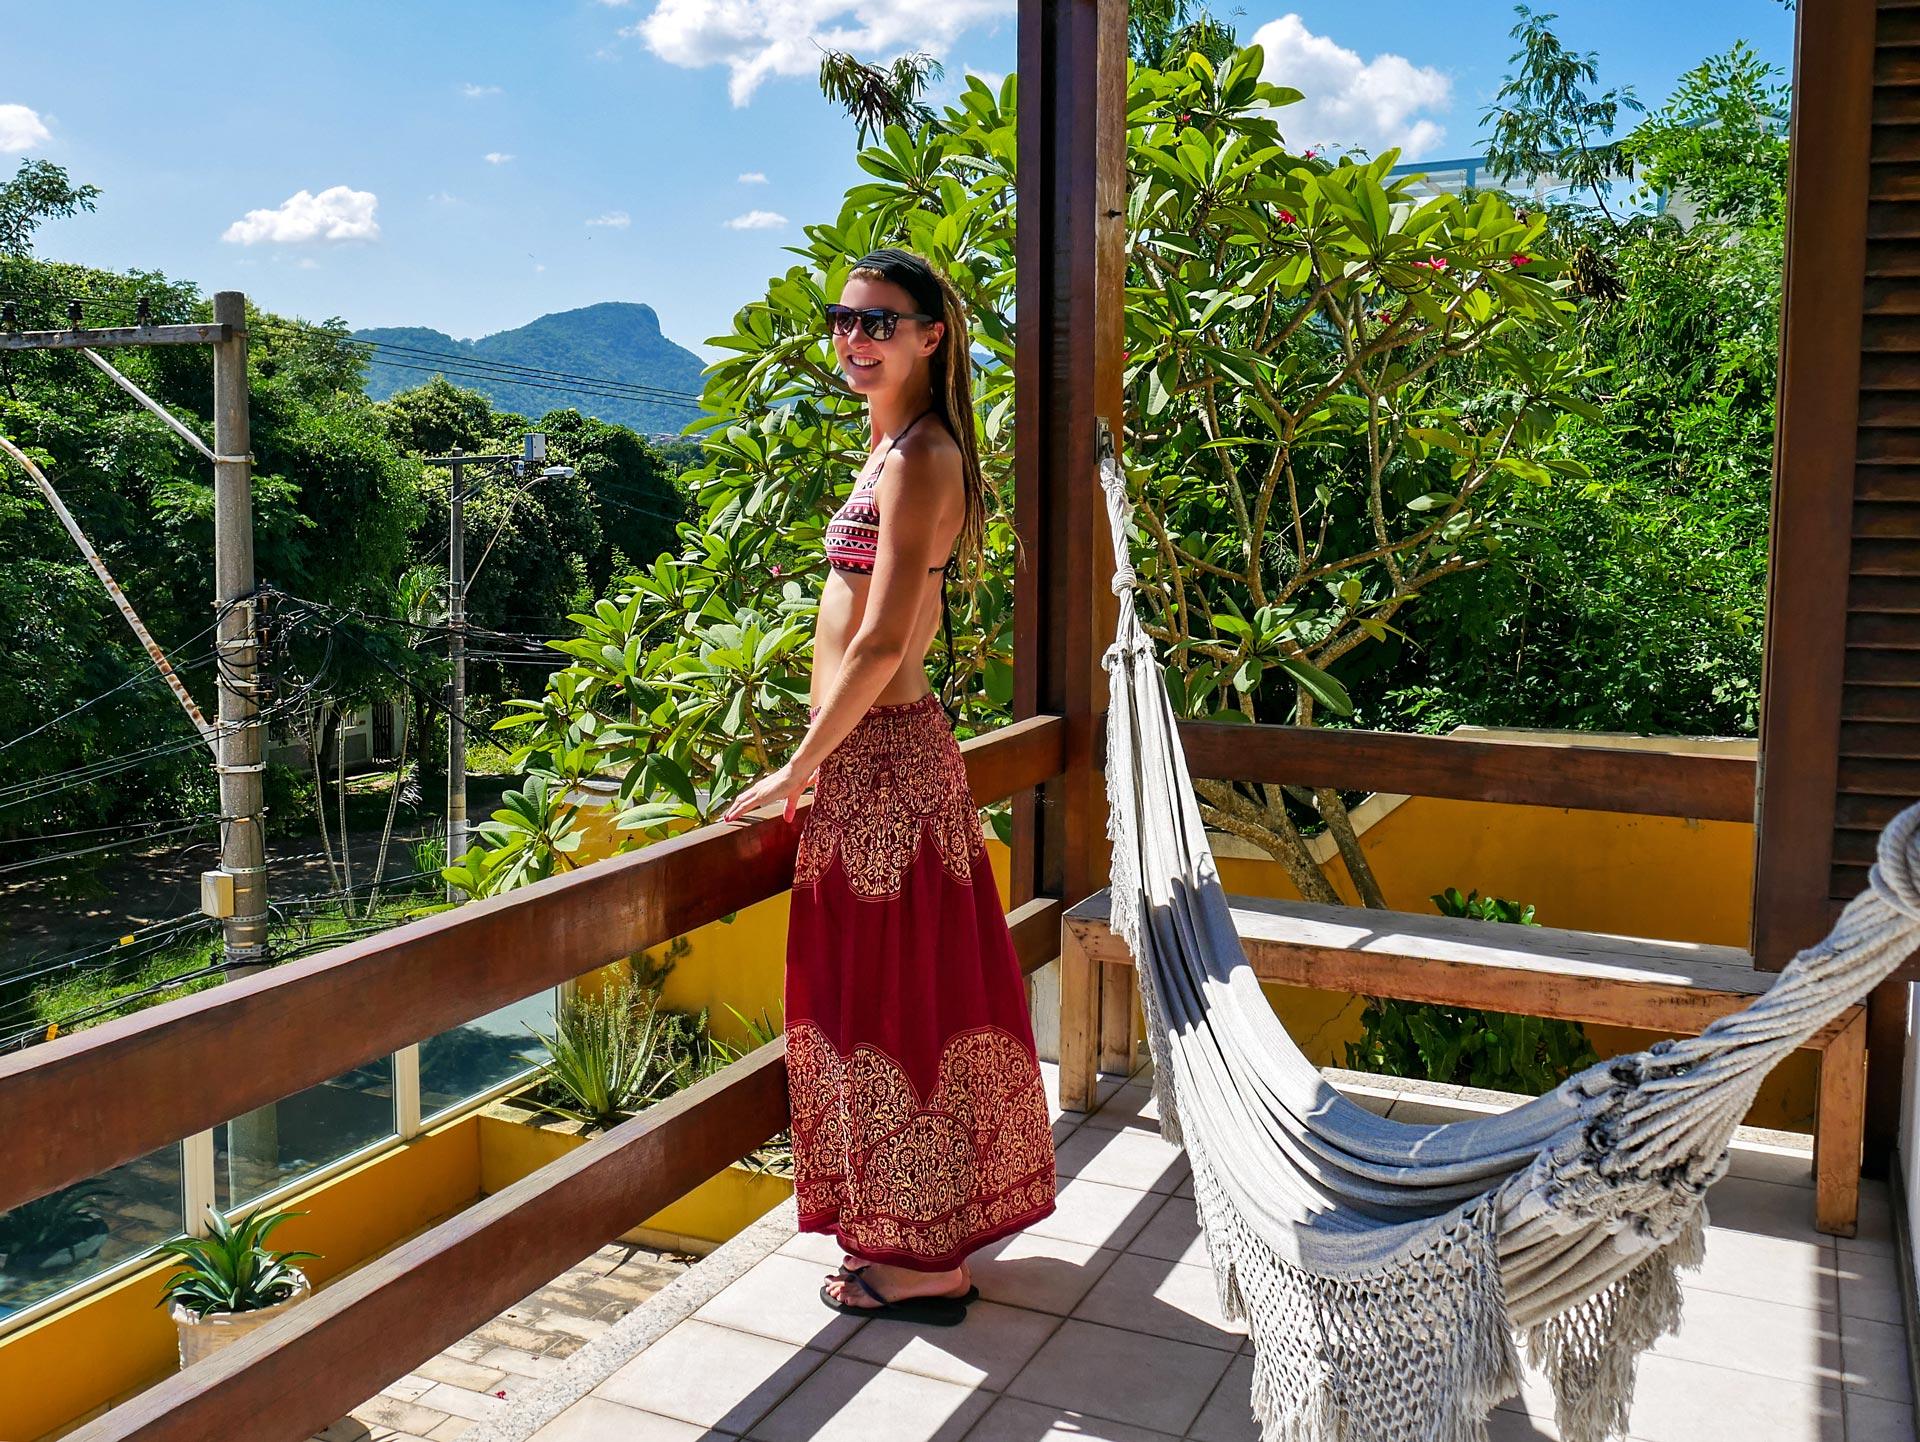 Rasta girl on balcony with hammock and nature view in Niterói, Brazil